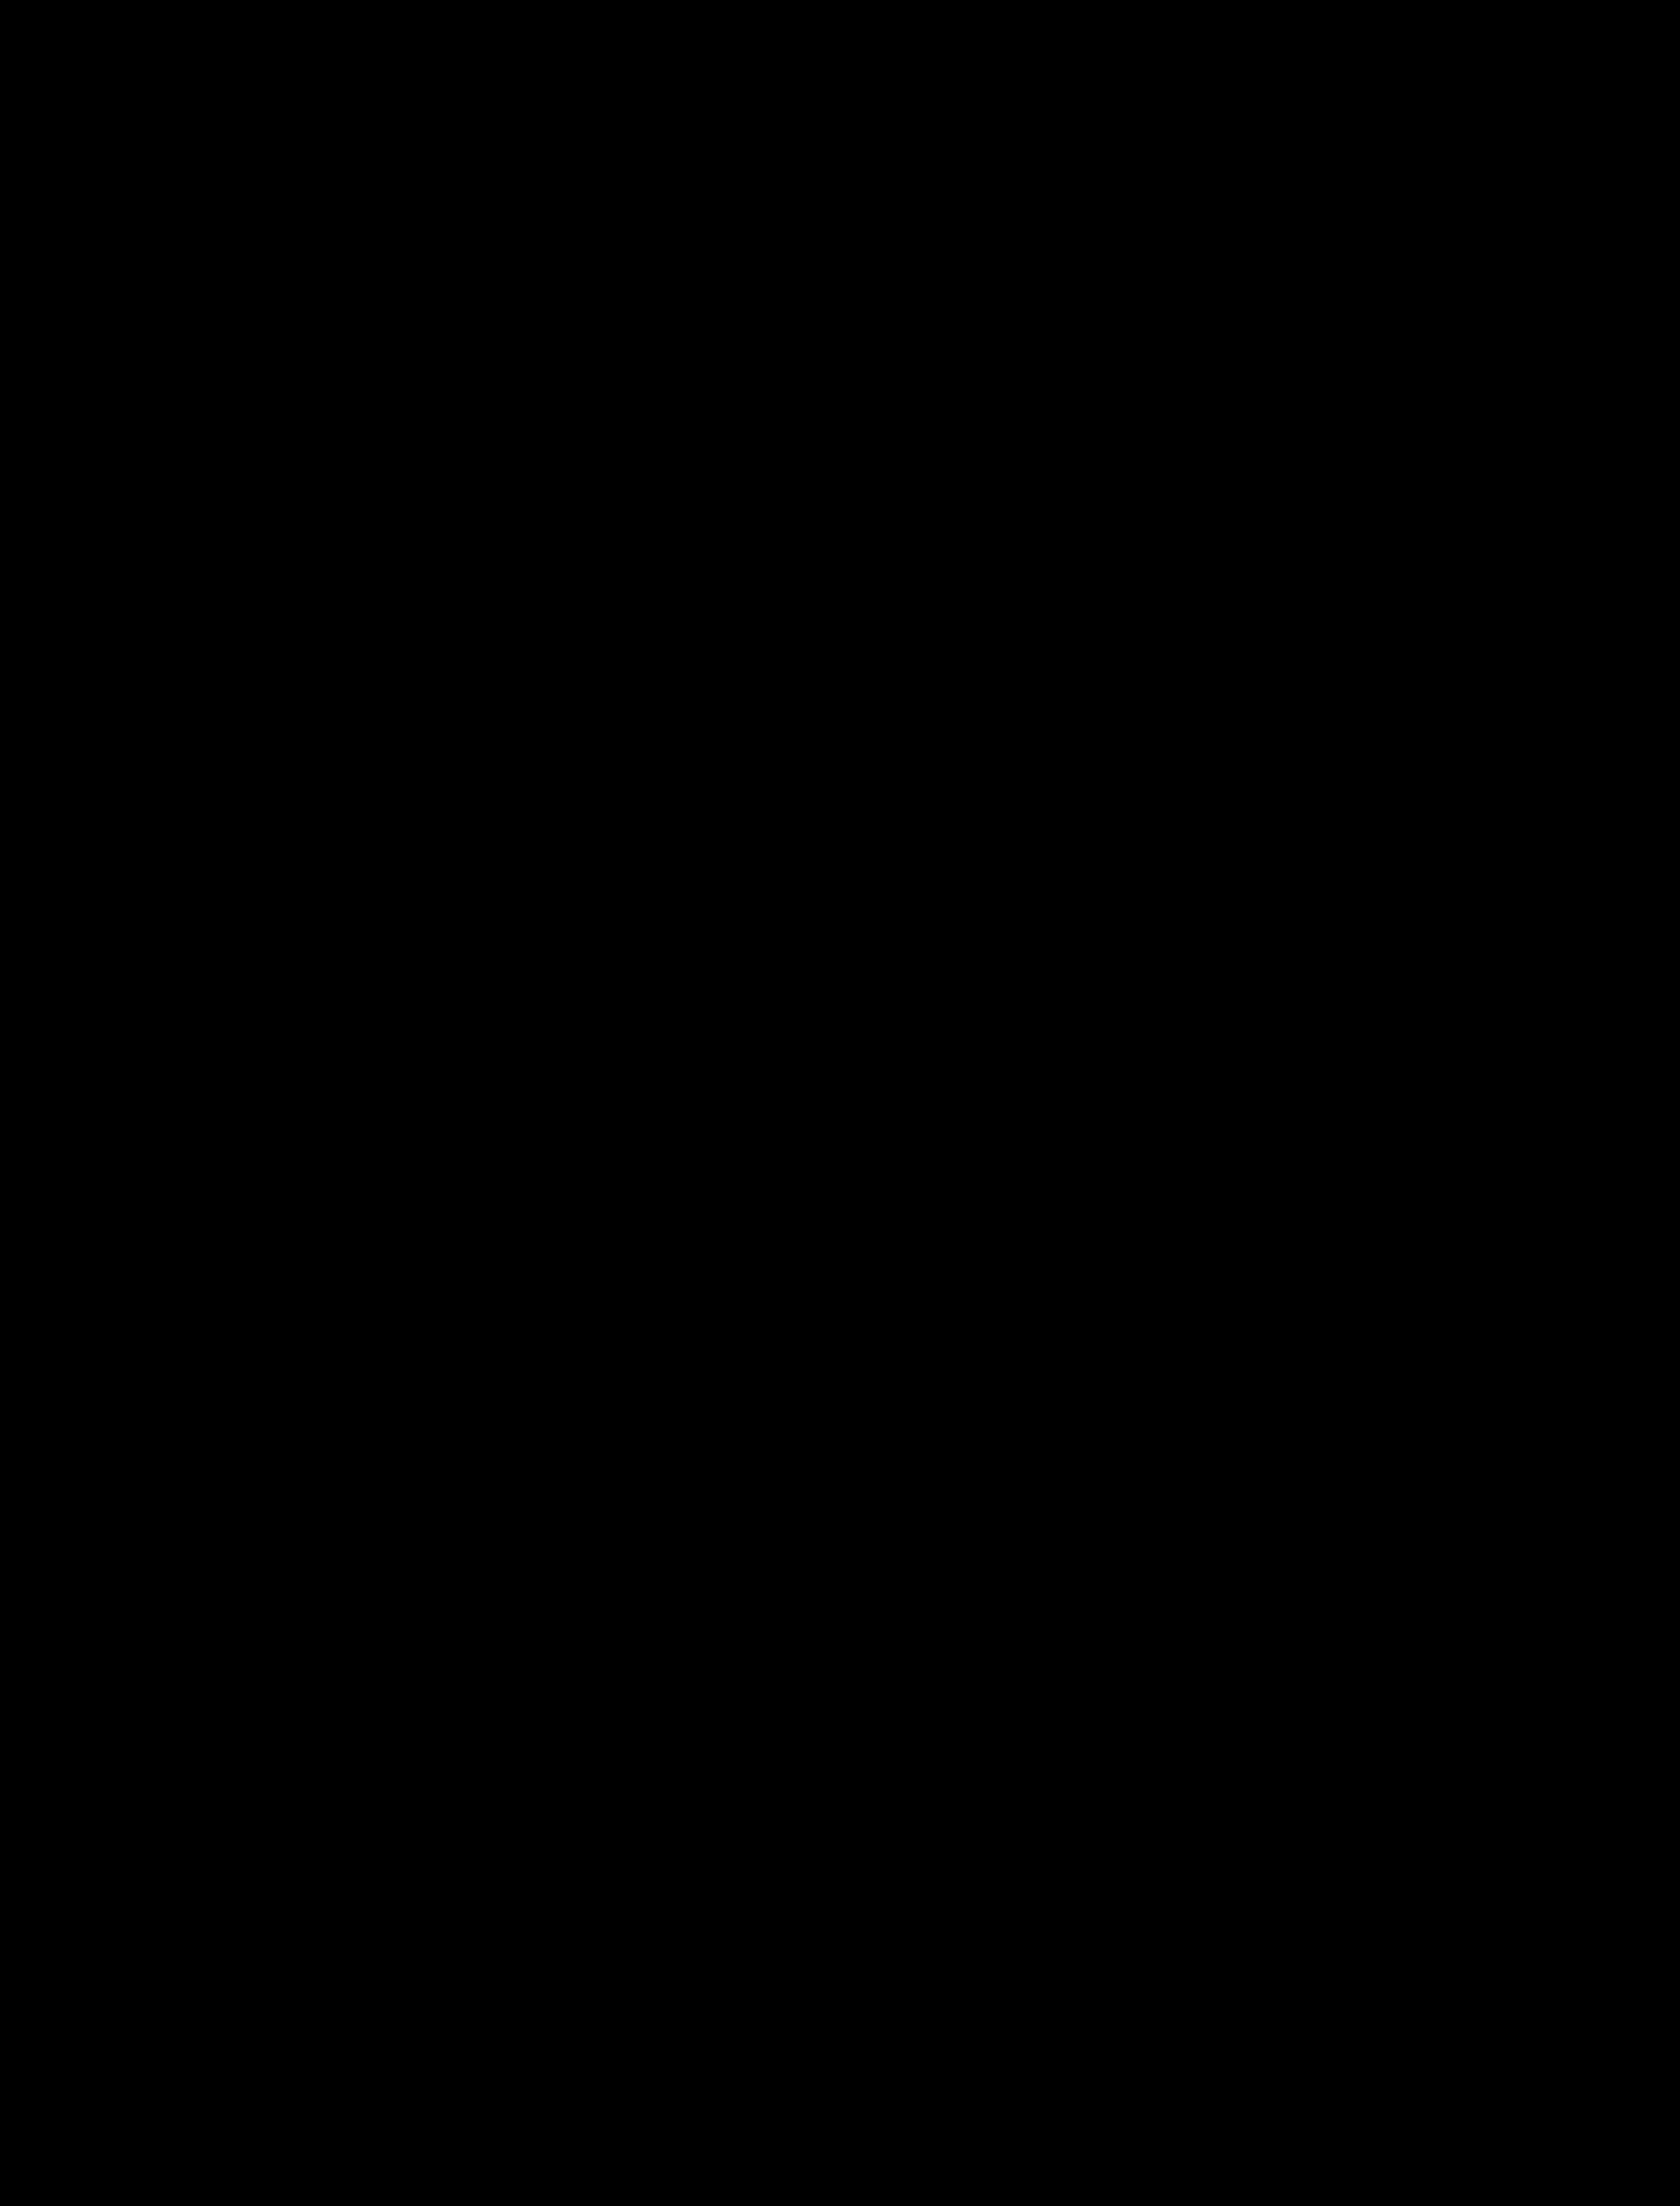 Square clipart black border. Big image png